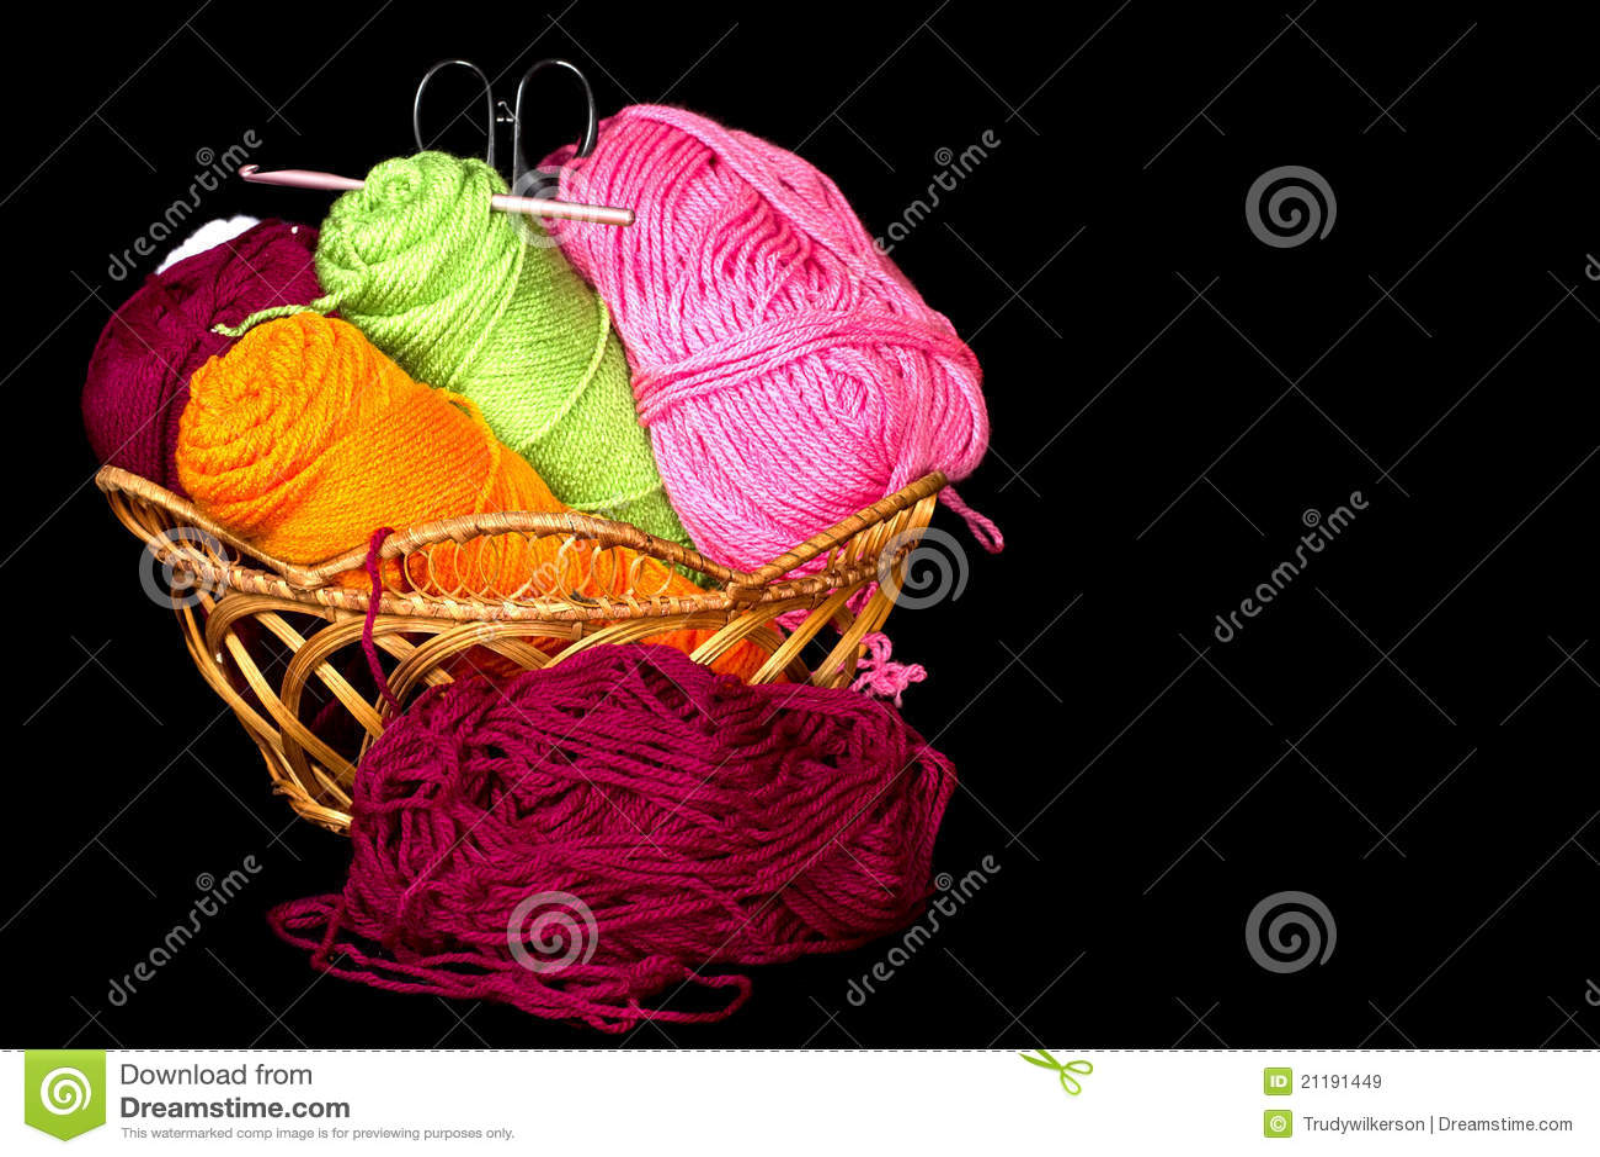 Yarn in Basket Closeup